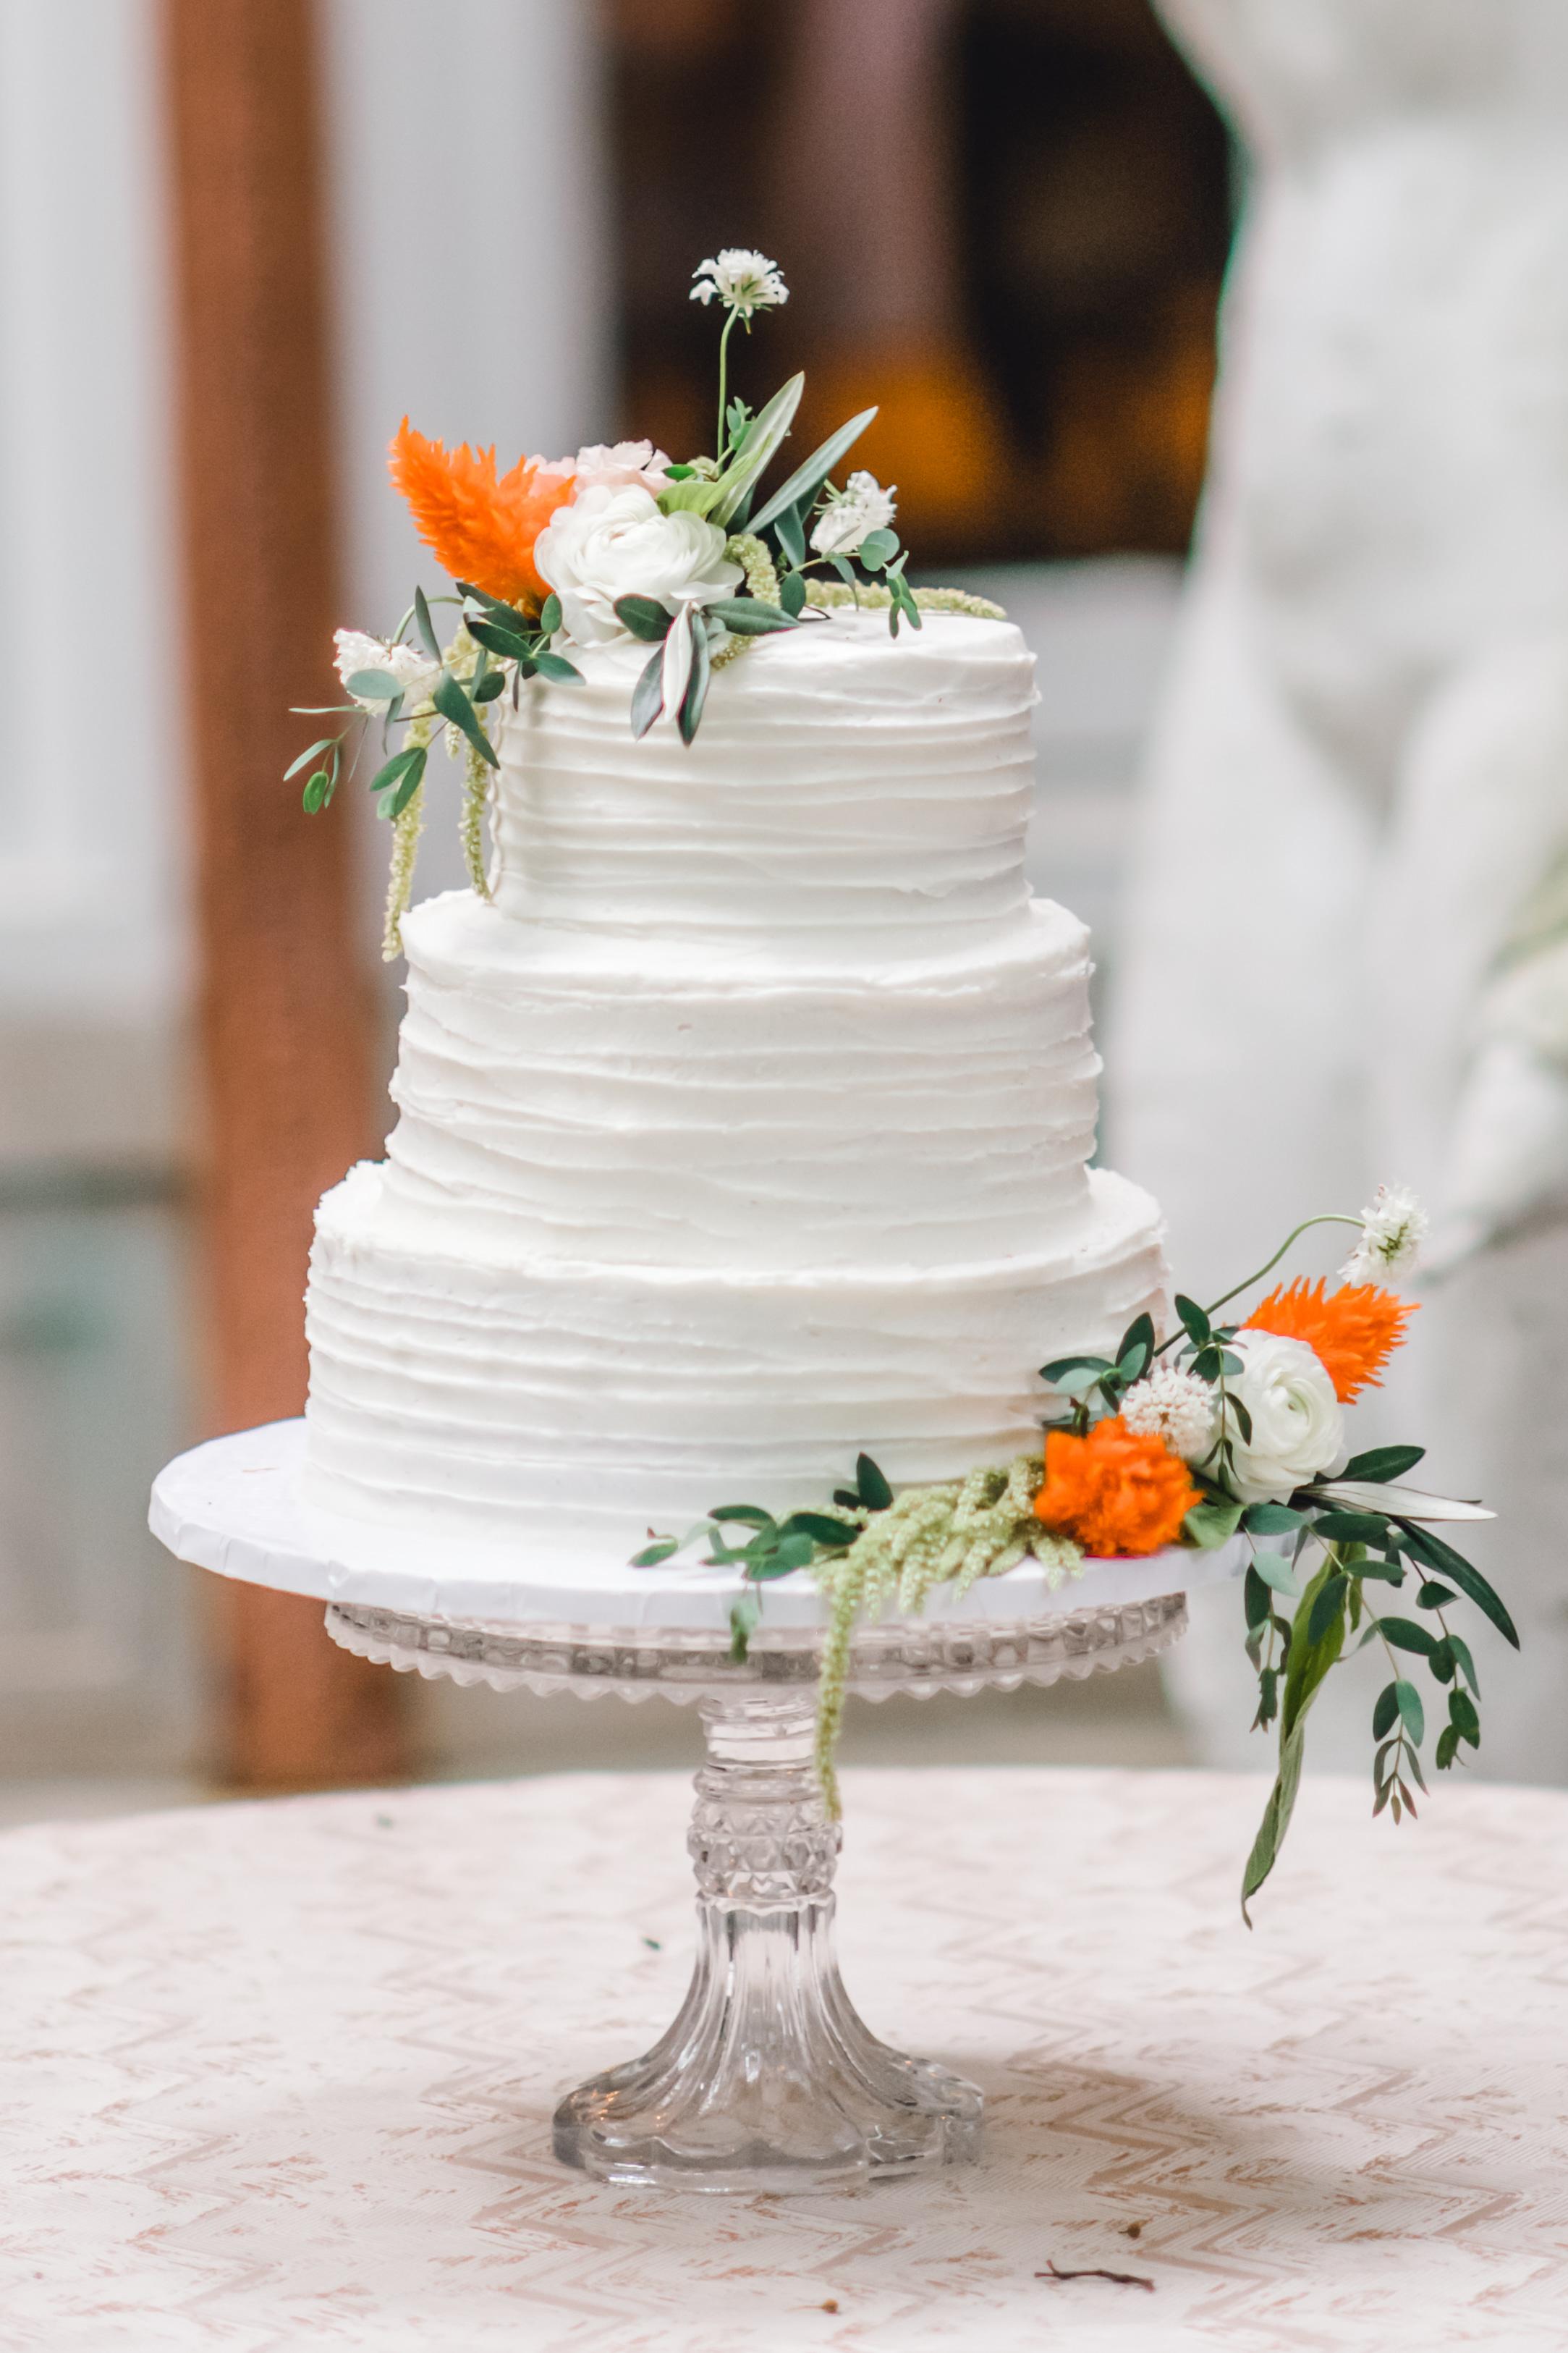 Pittsburgh Wedding Planner Mansion in Butler European White Buttercream Cake with Orange Flowers